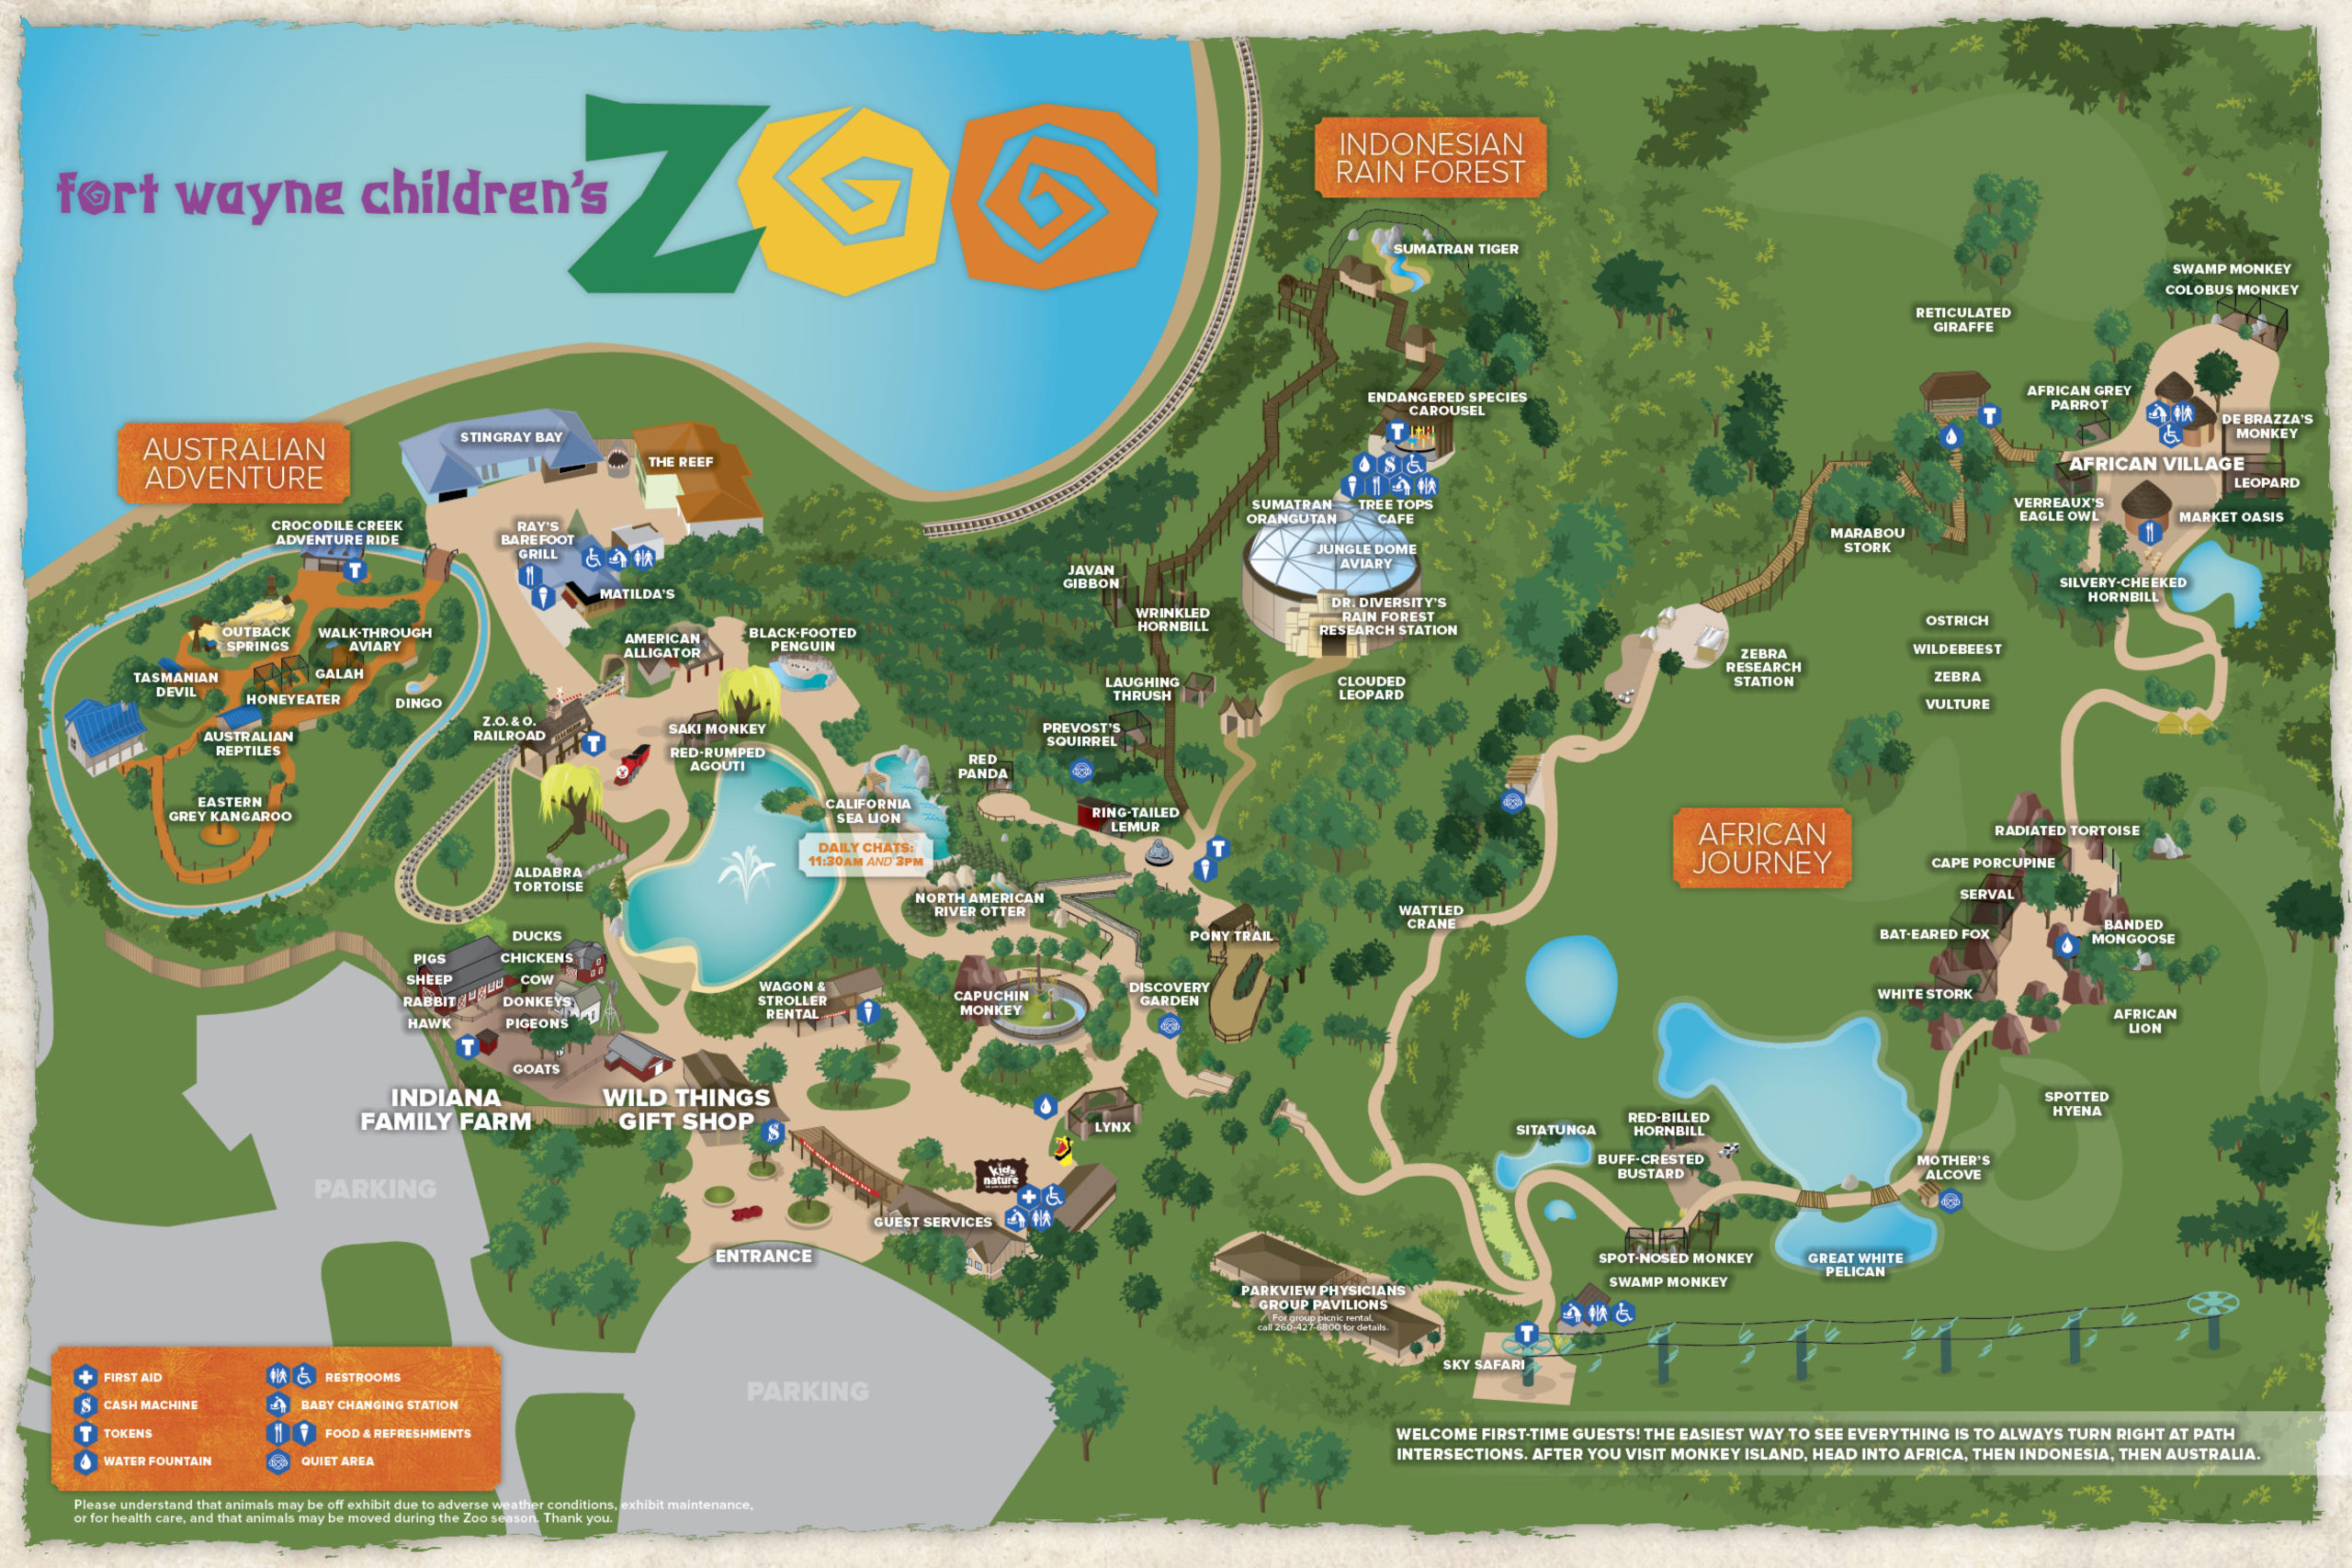 Old Australia Zoo Map.Plan Your Visit Fort Wayne Children S Zoo